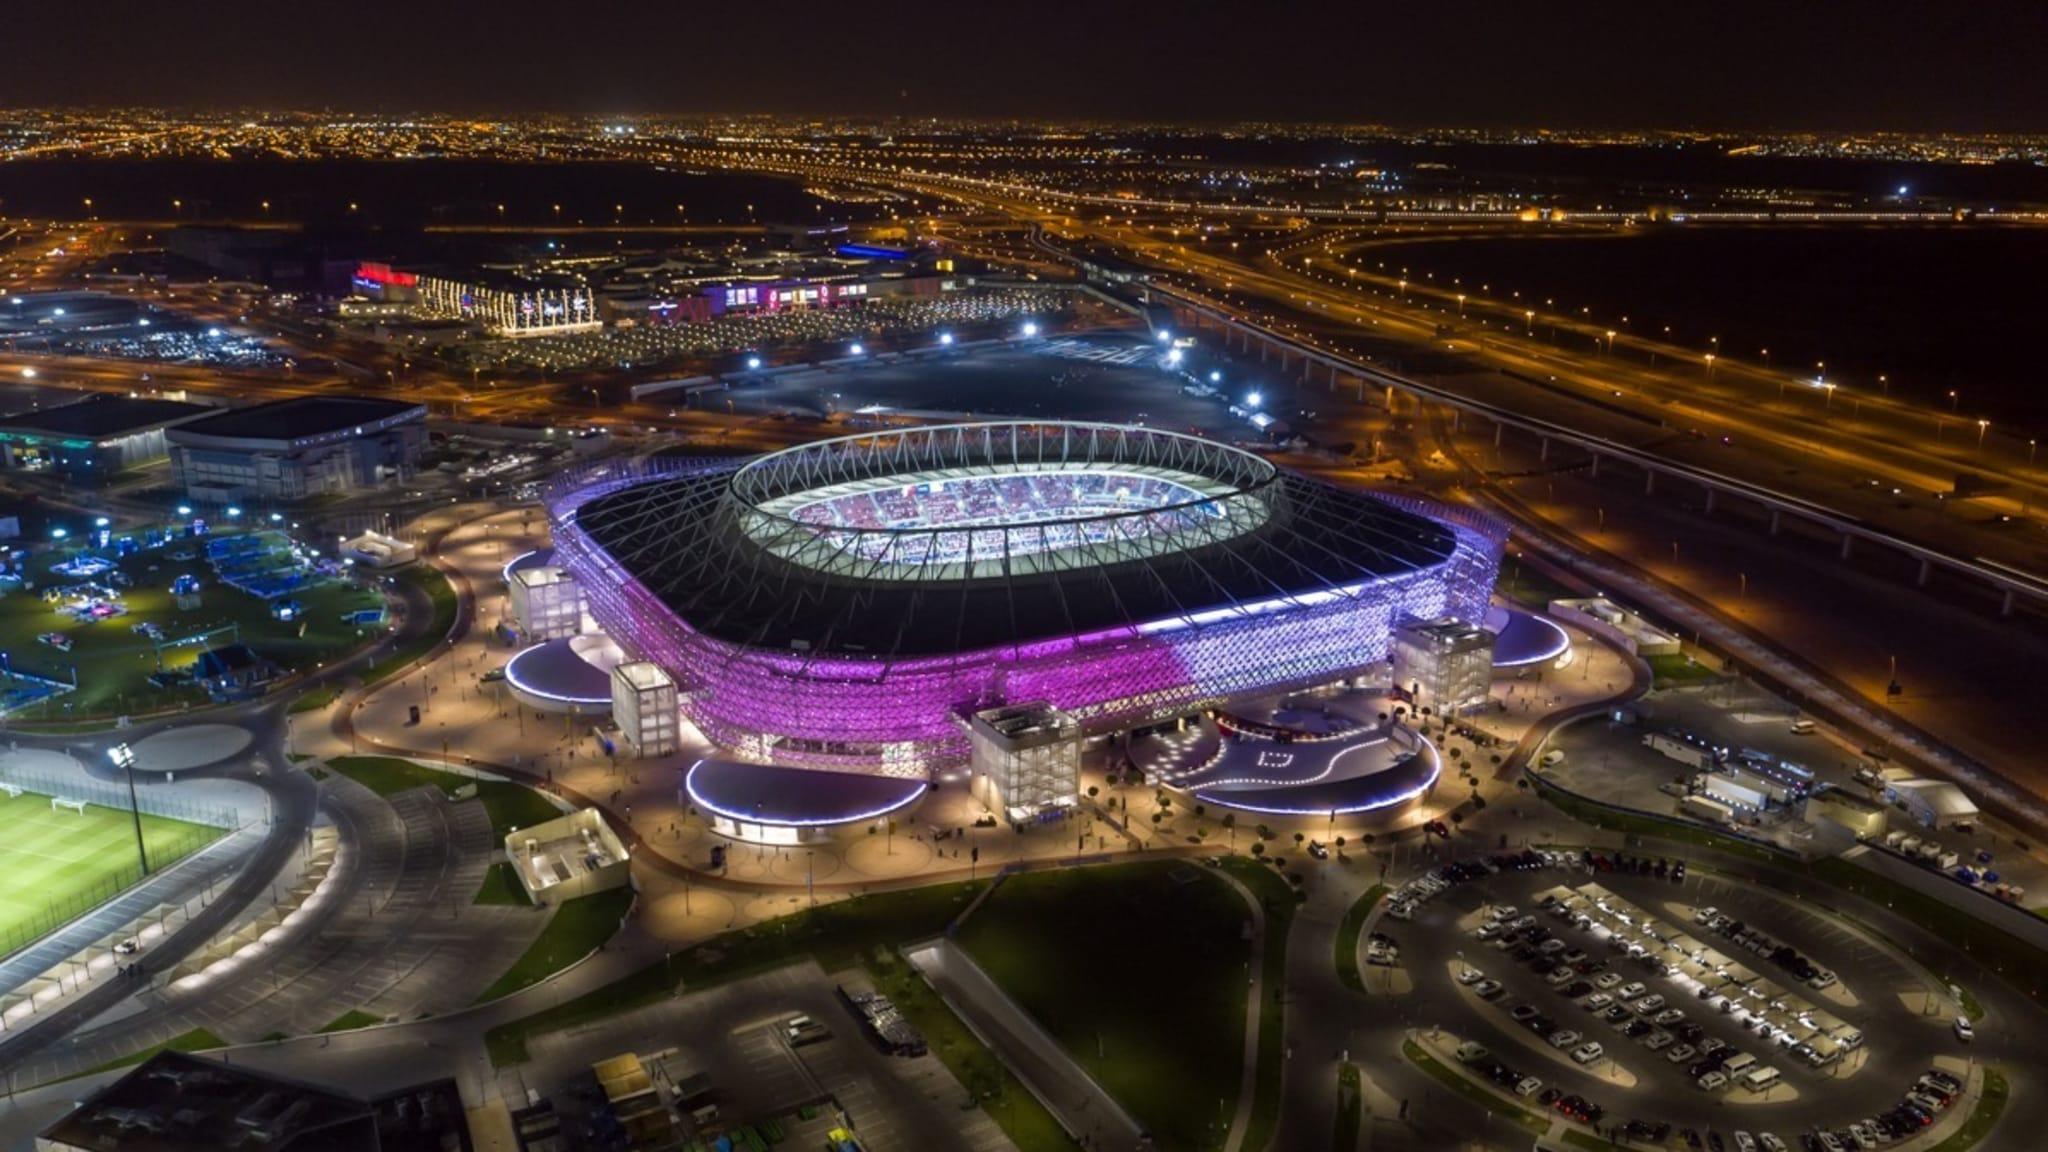 Ahmad Bin Ali Stadium